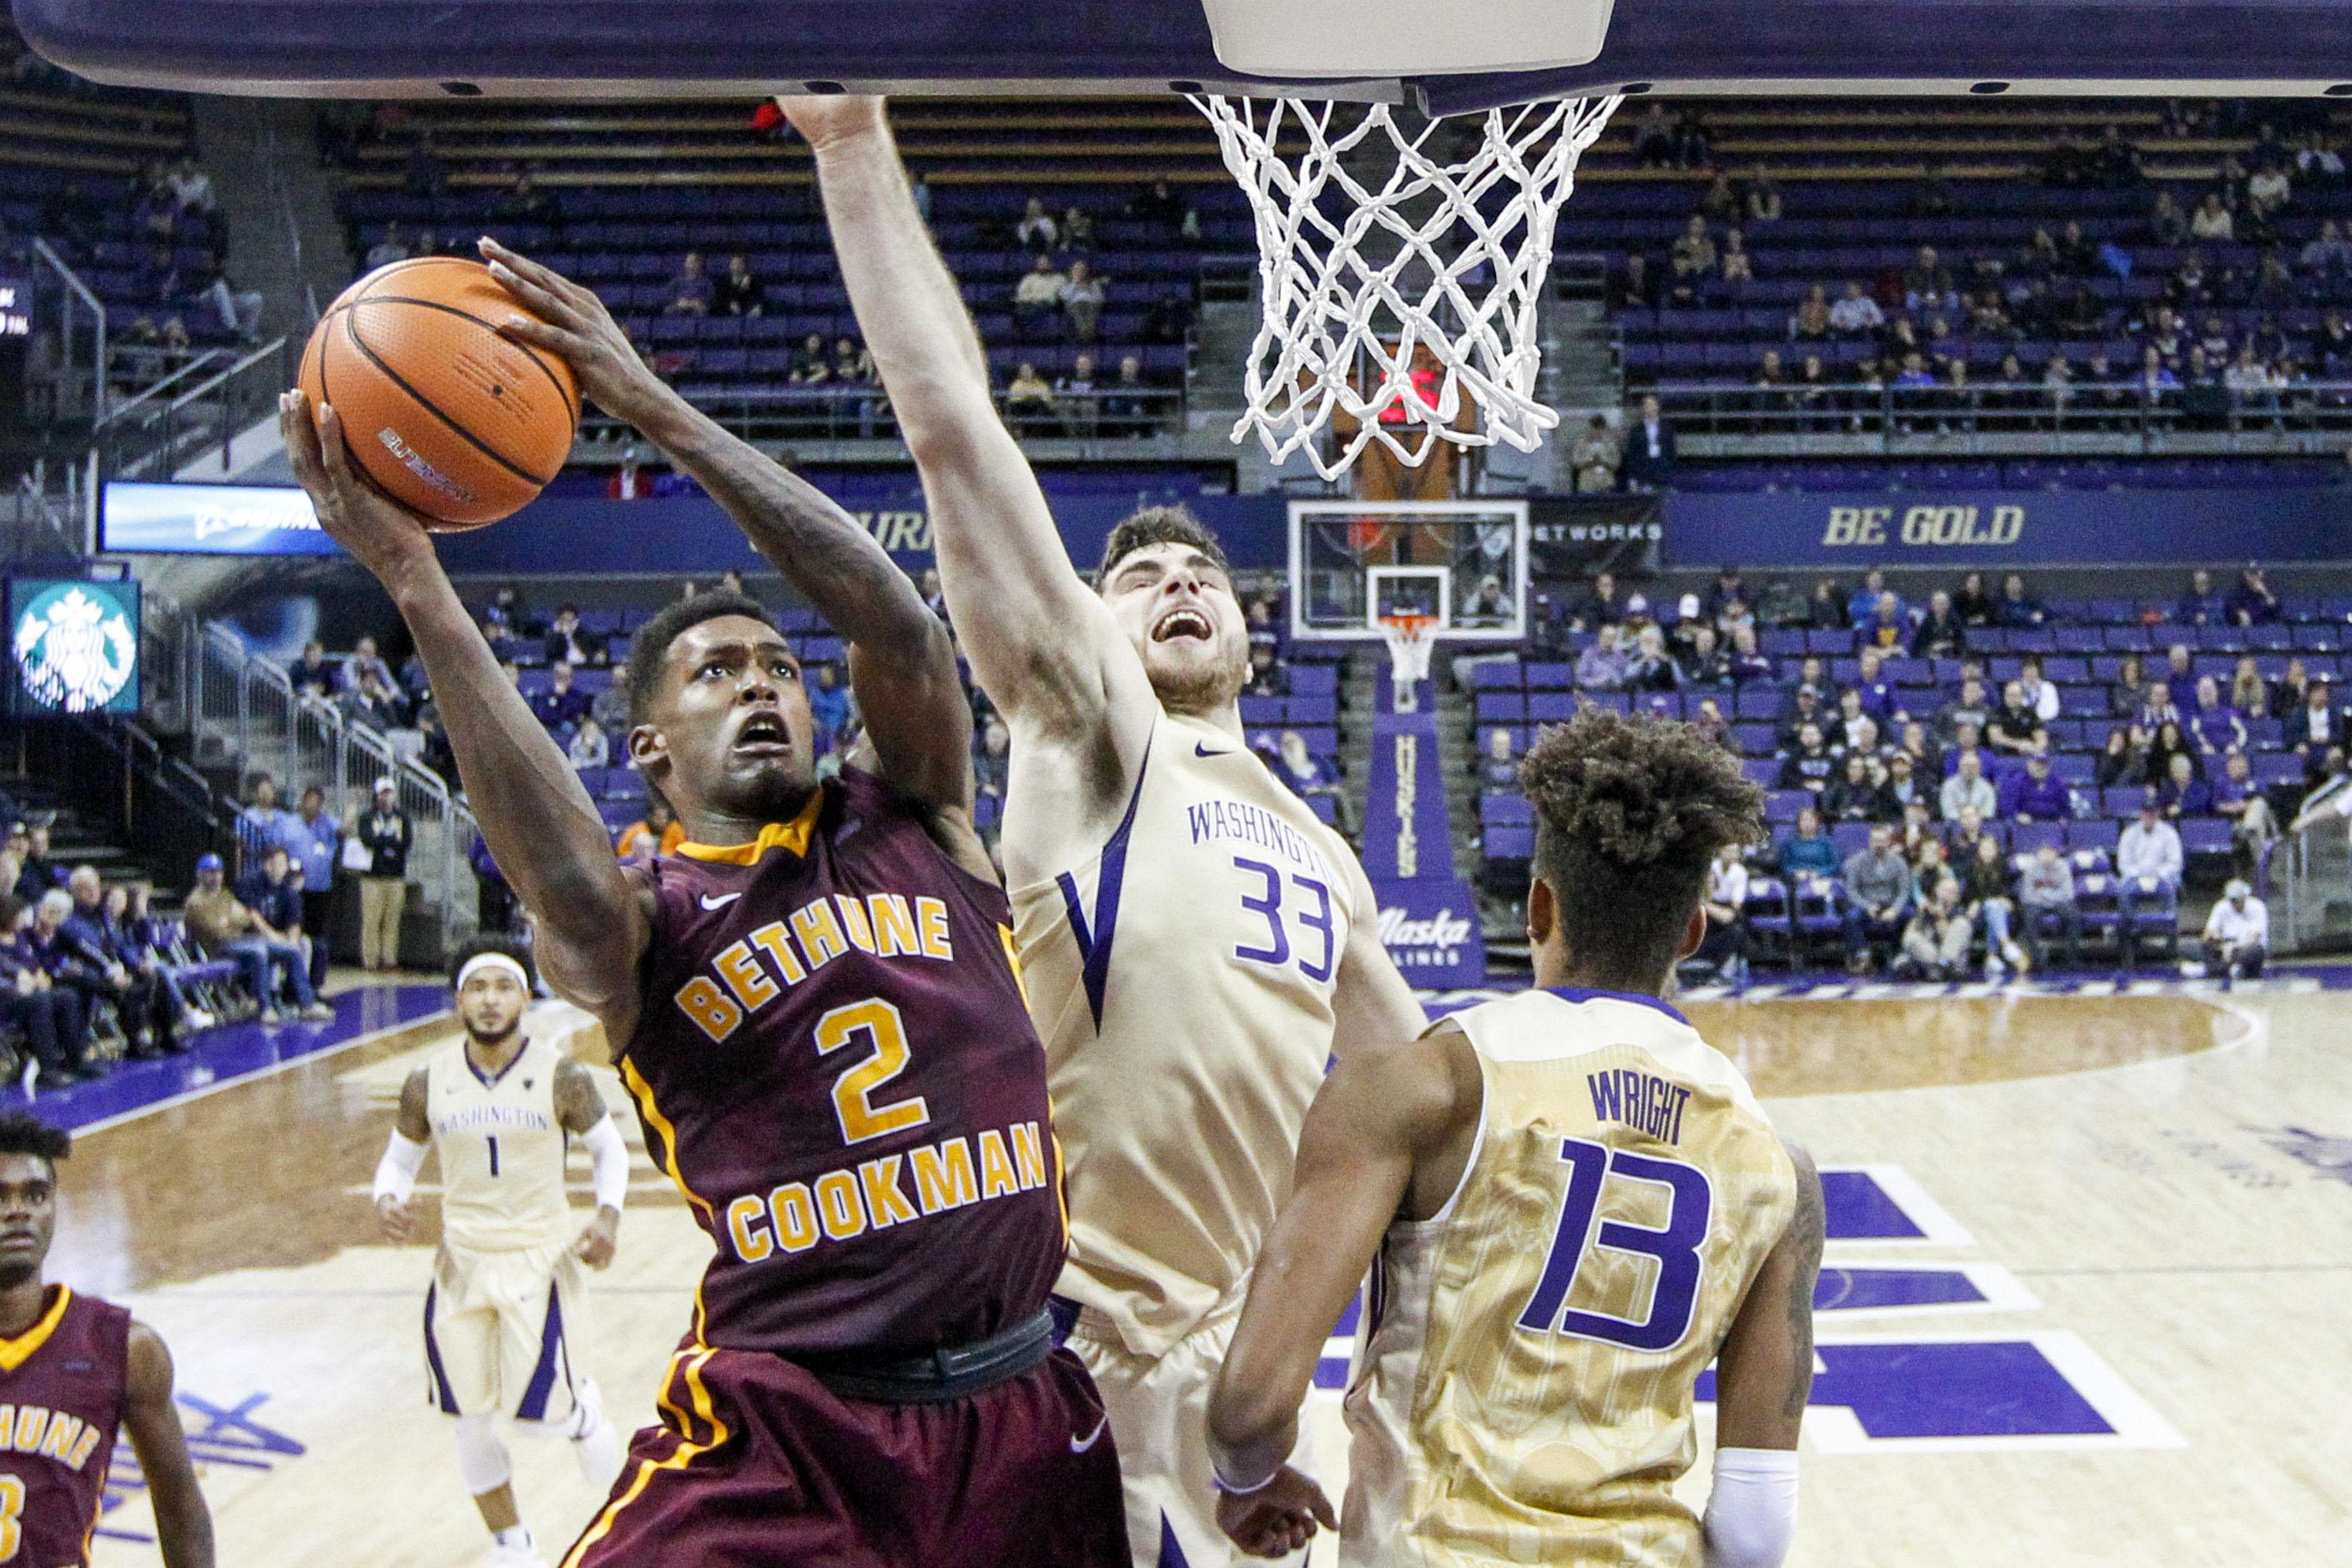 NCAA Basketball: Bethune-Cookman at Washington